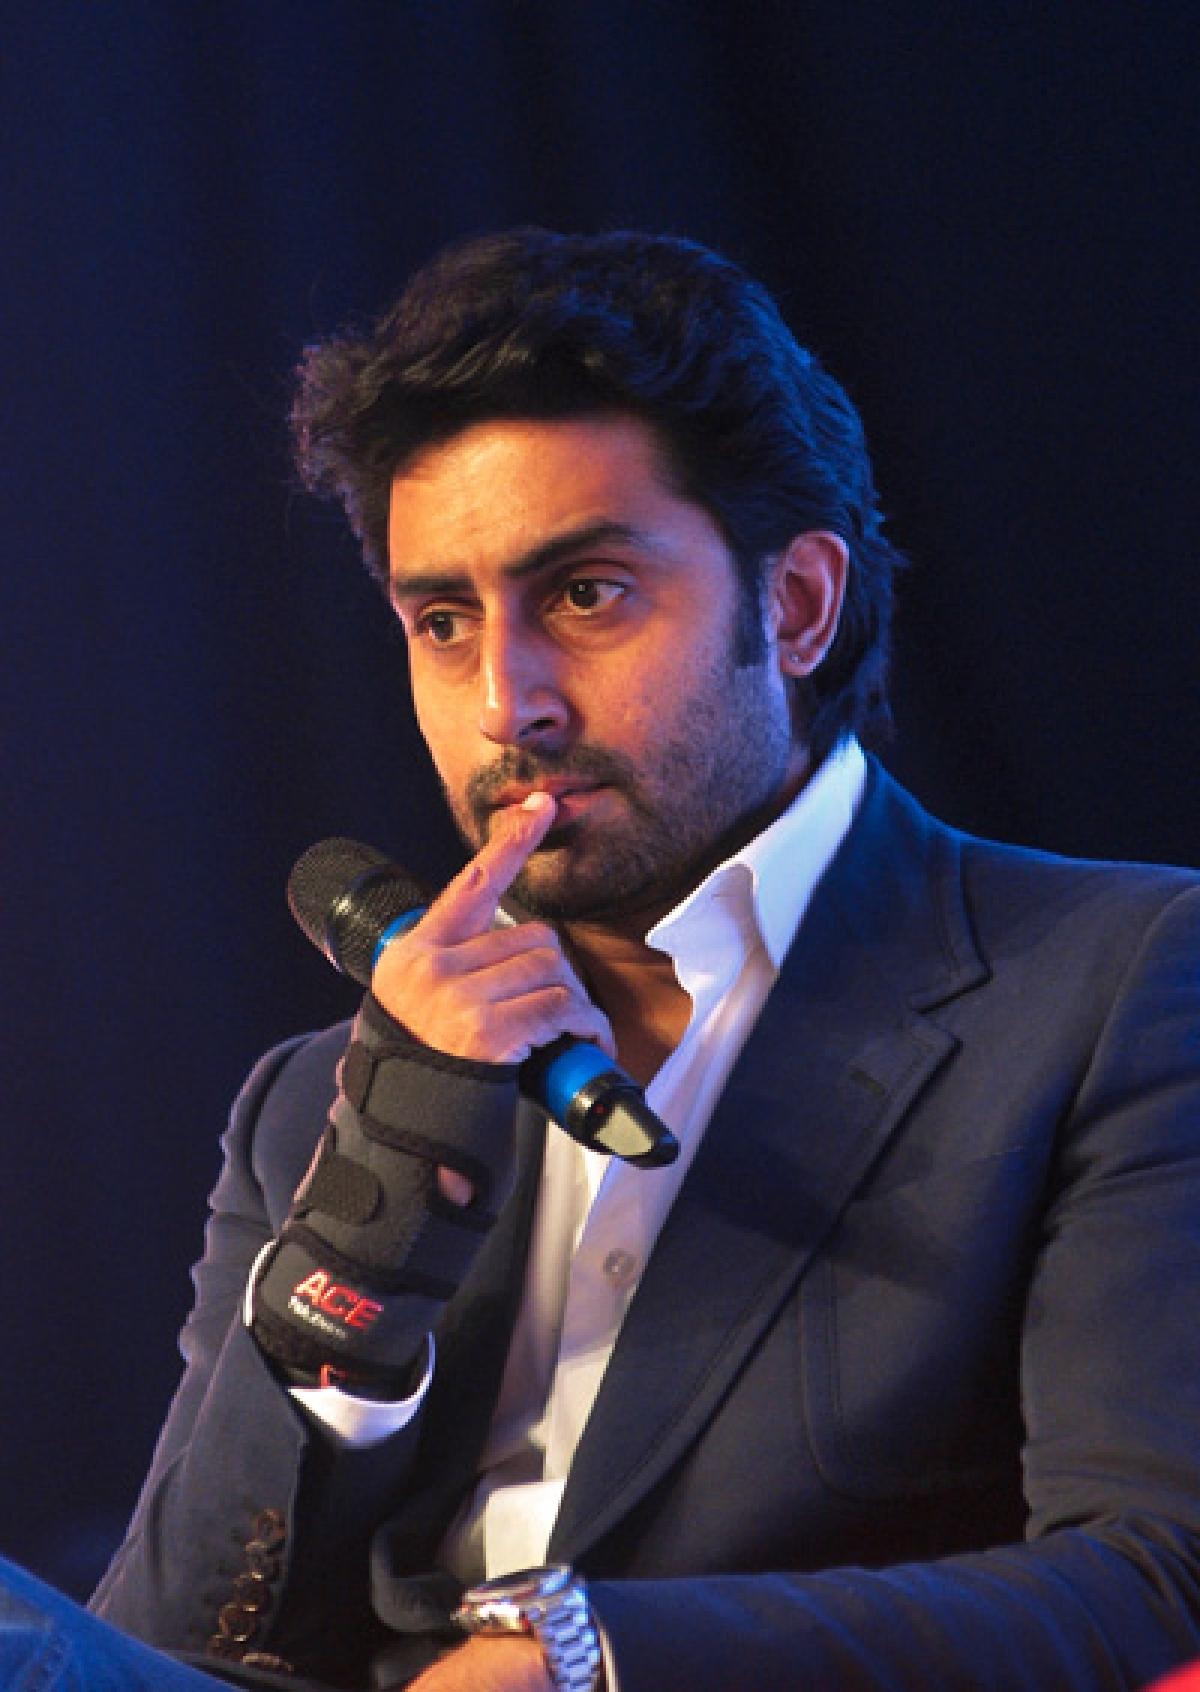 Abhishek Bachchan not part of 'Hera Pheri 3' anymore